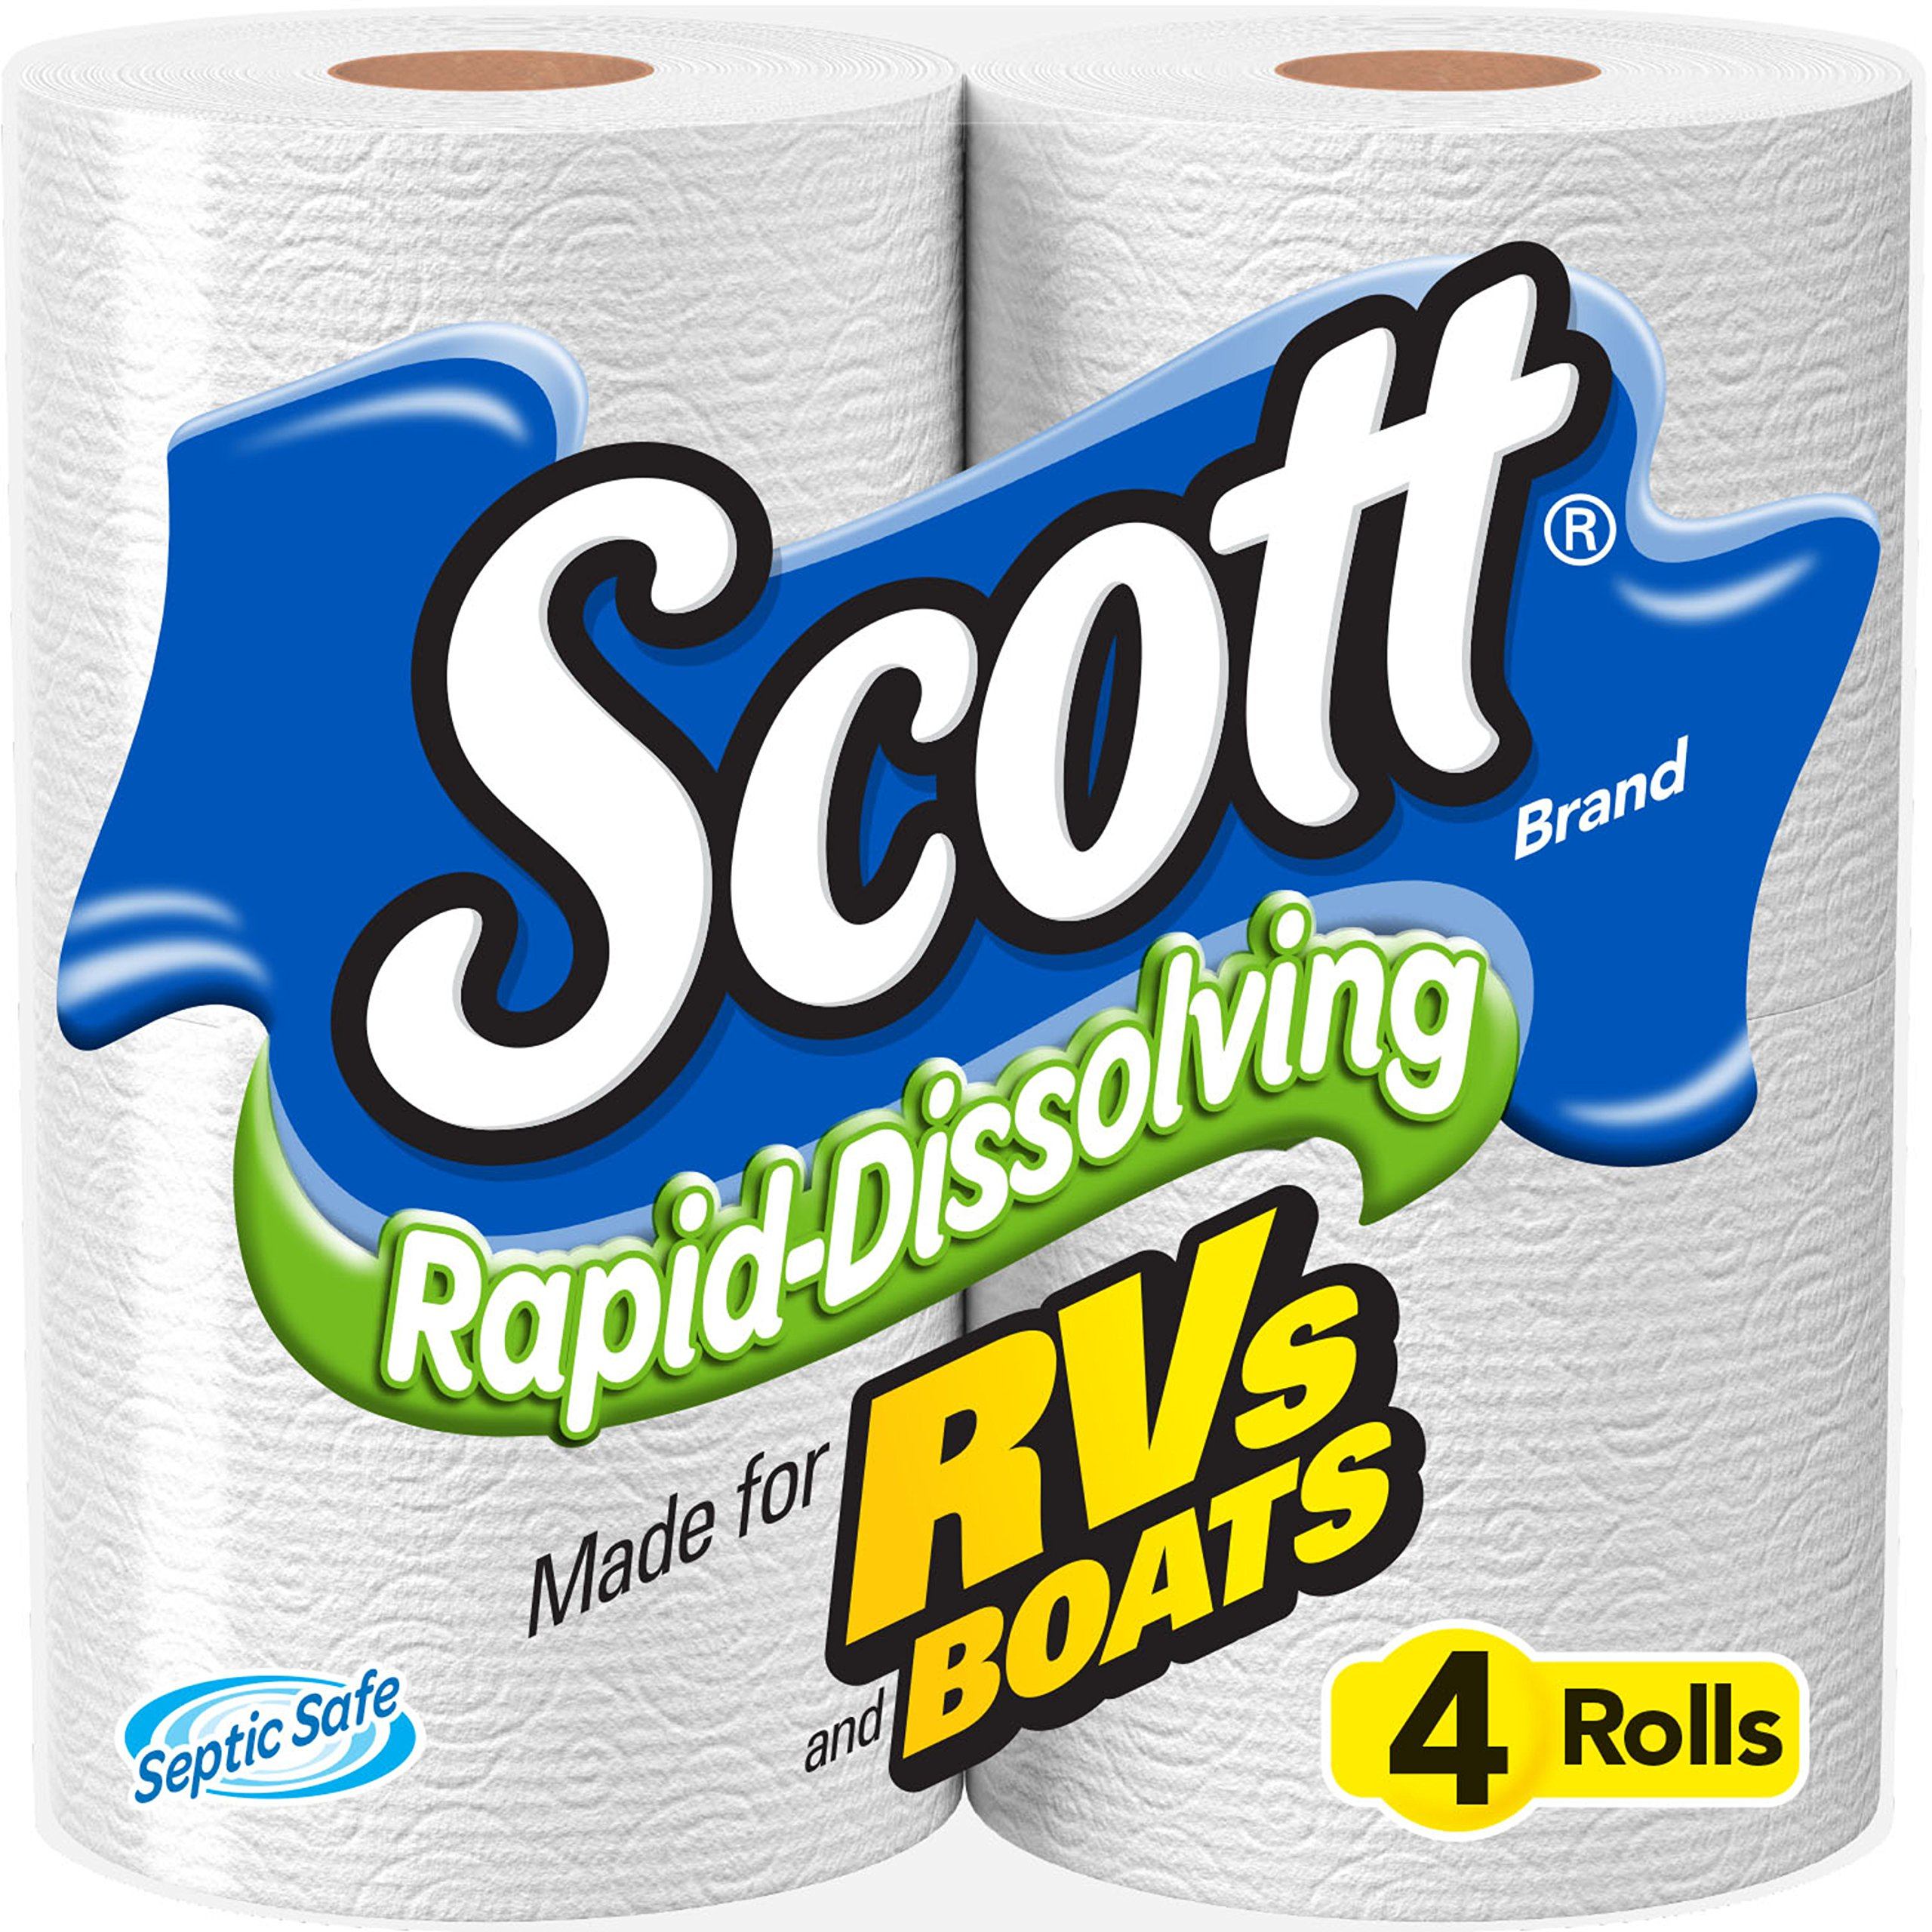 Scott Rapid-Dissolving Toilet Paper, Bath Tissue for RV & Boats , 4ct packs X 12= 48 rolls by Scott